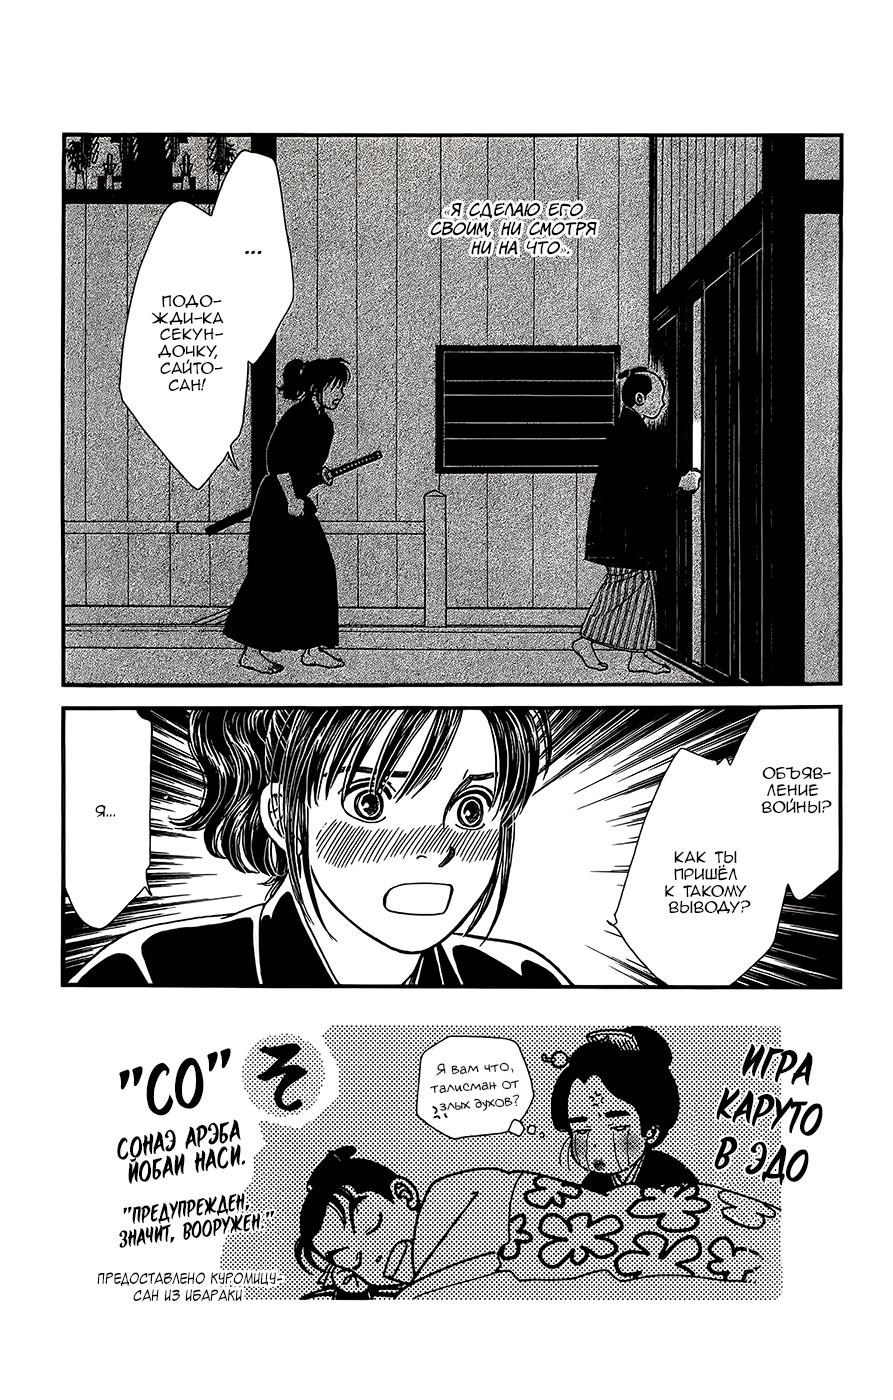 https://r1.ninemanga.com/comics/pic2/27/25179/343421/1511313399941.jpg Page 1